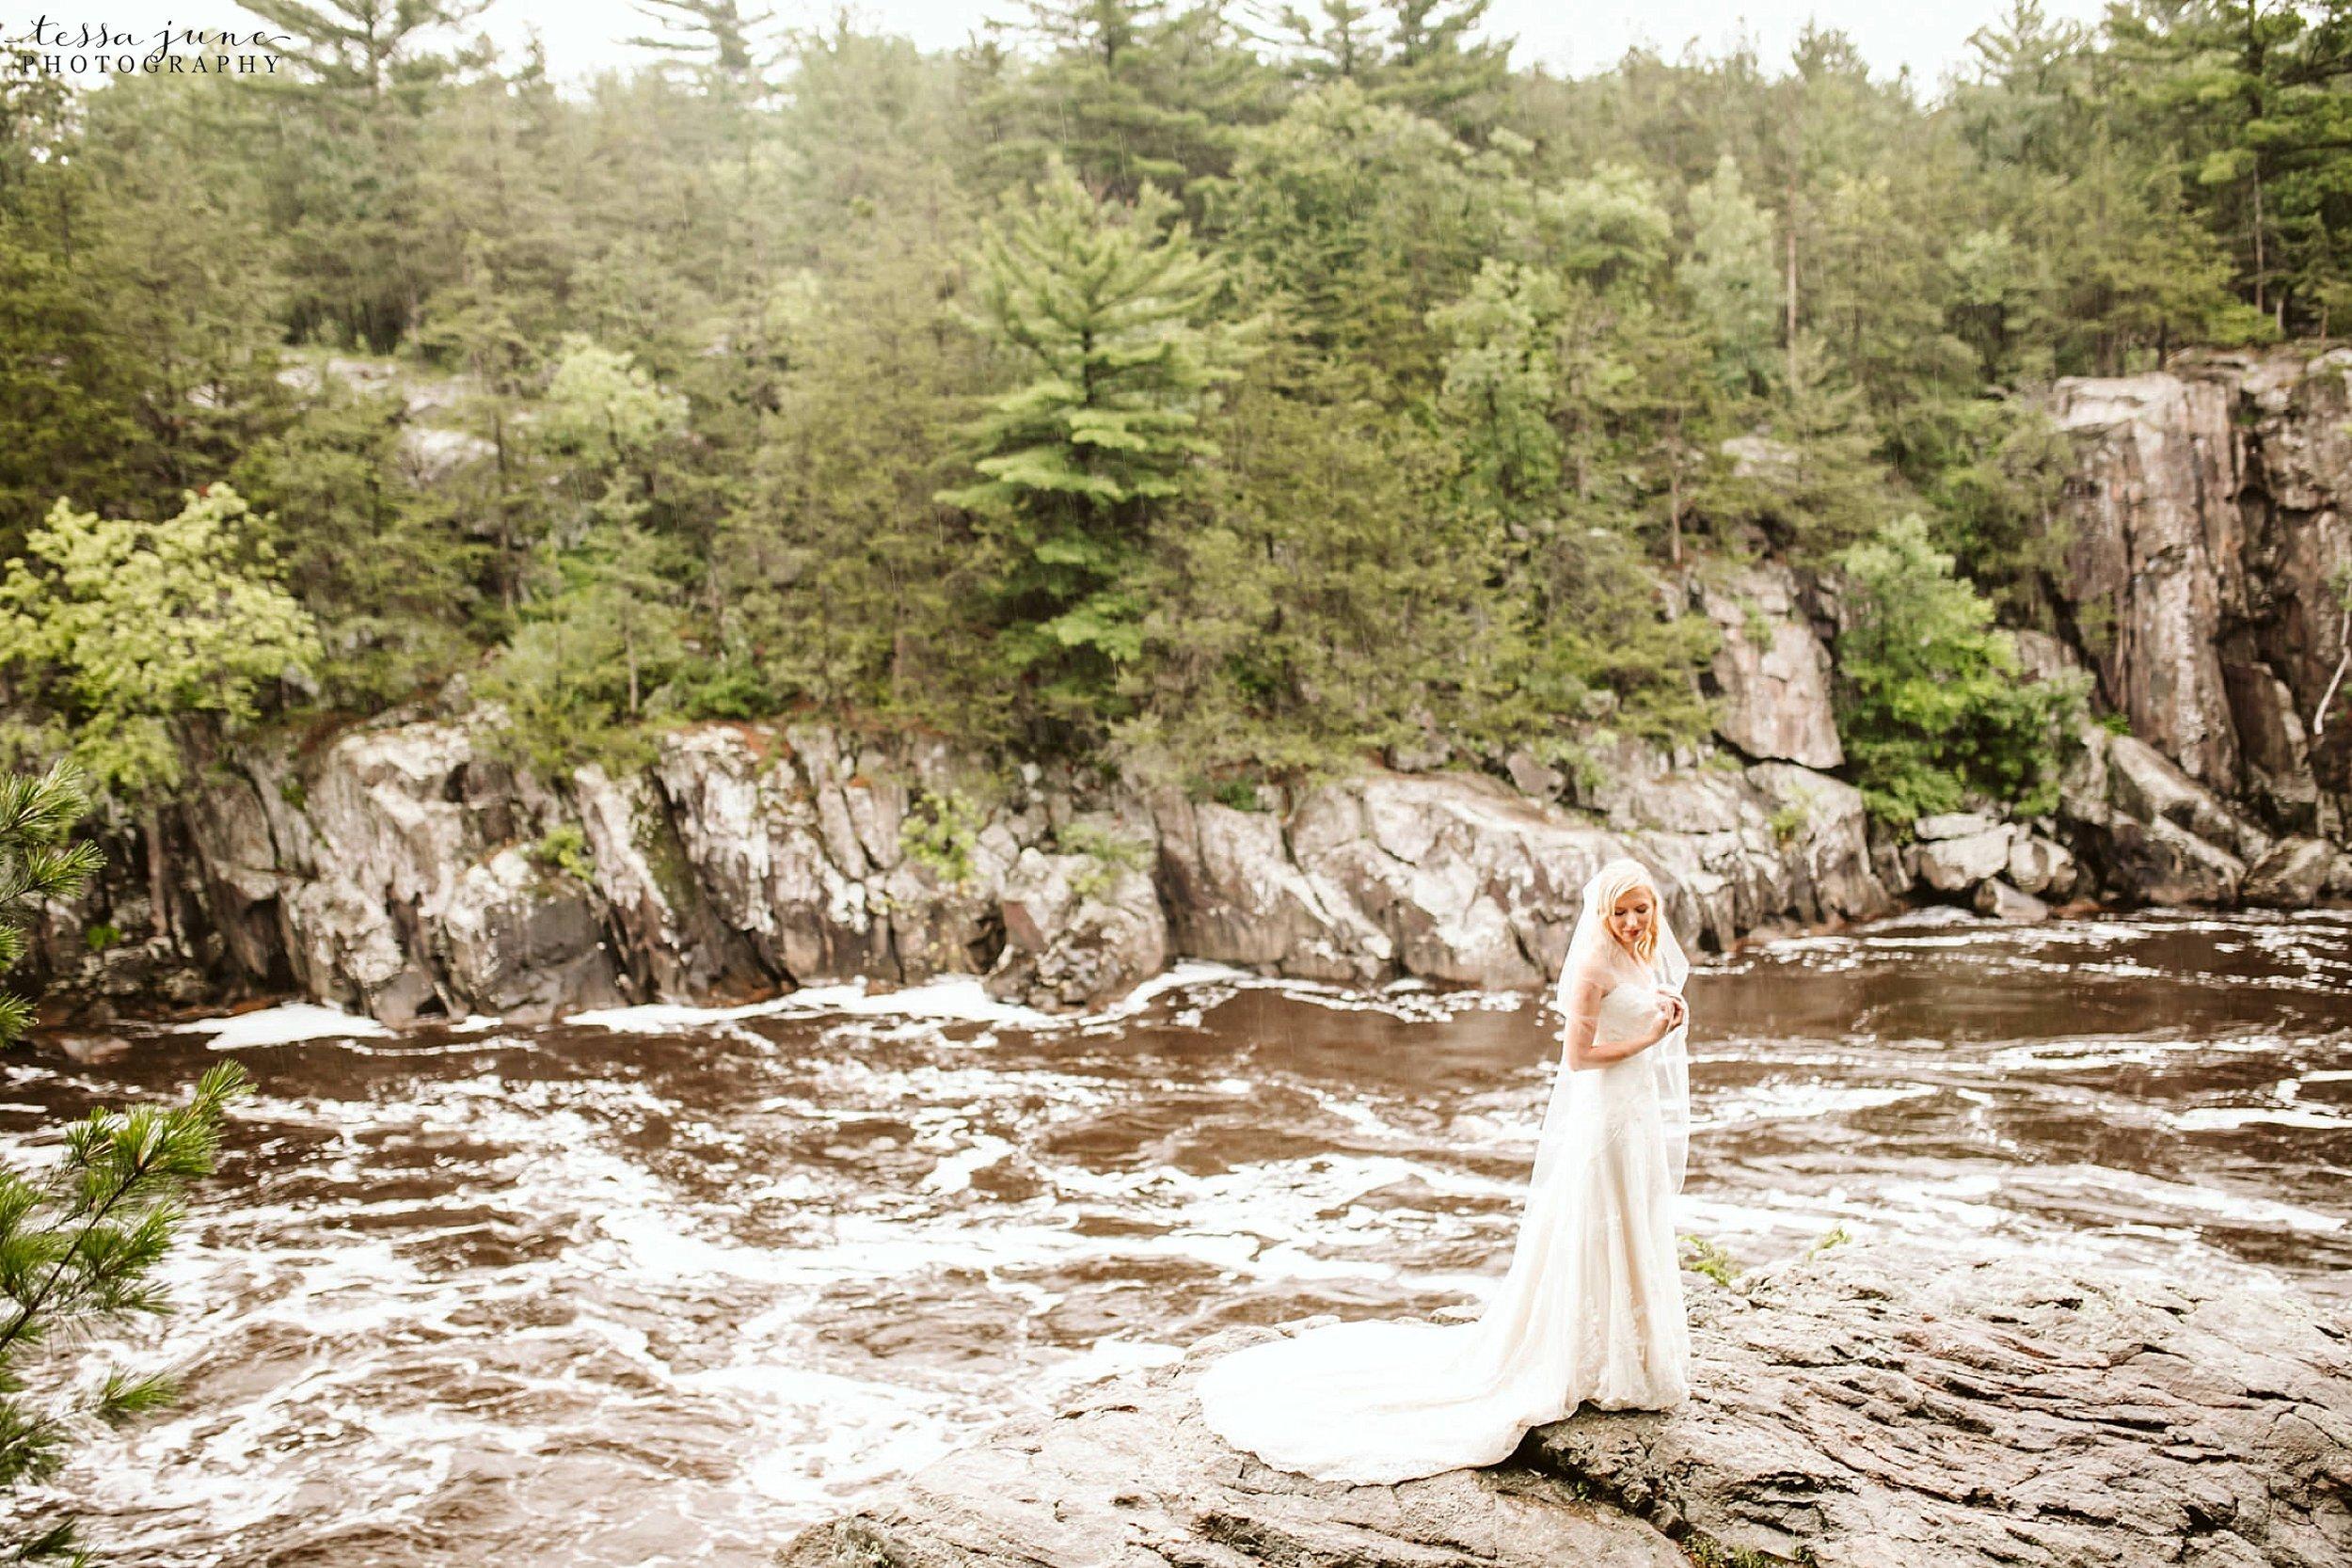 taylors-falls-rainy-elopement-wedding-interstate-state-park-12.jpg